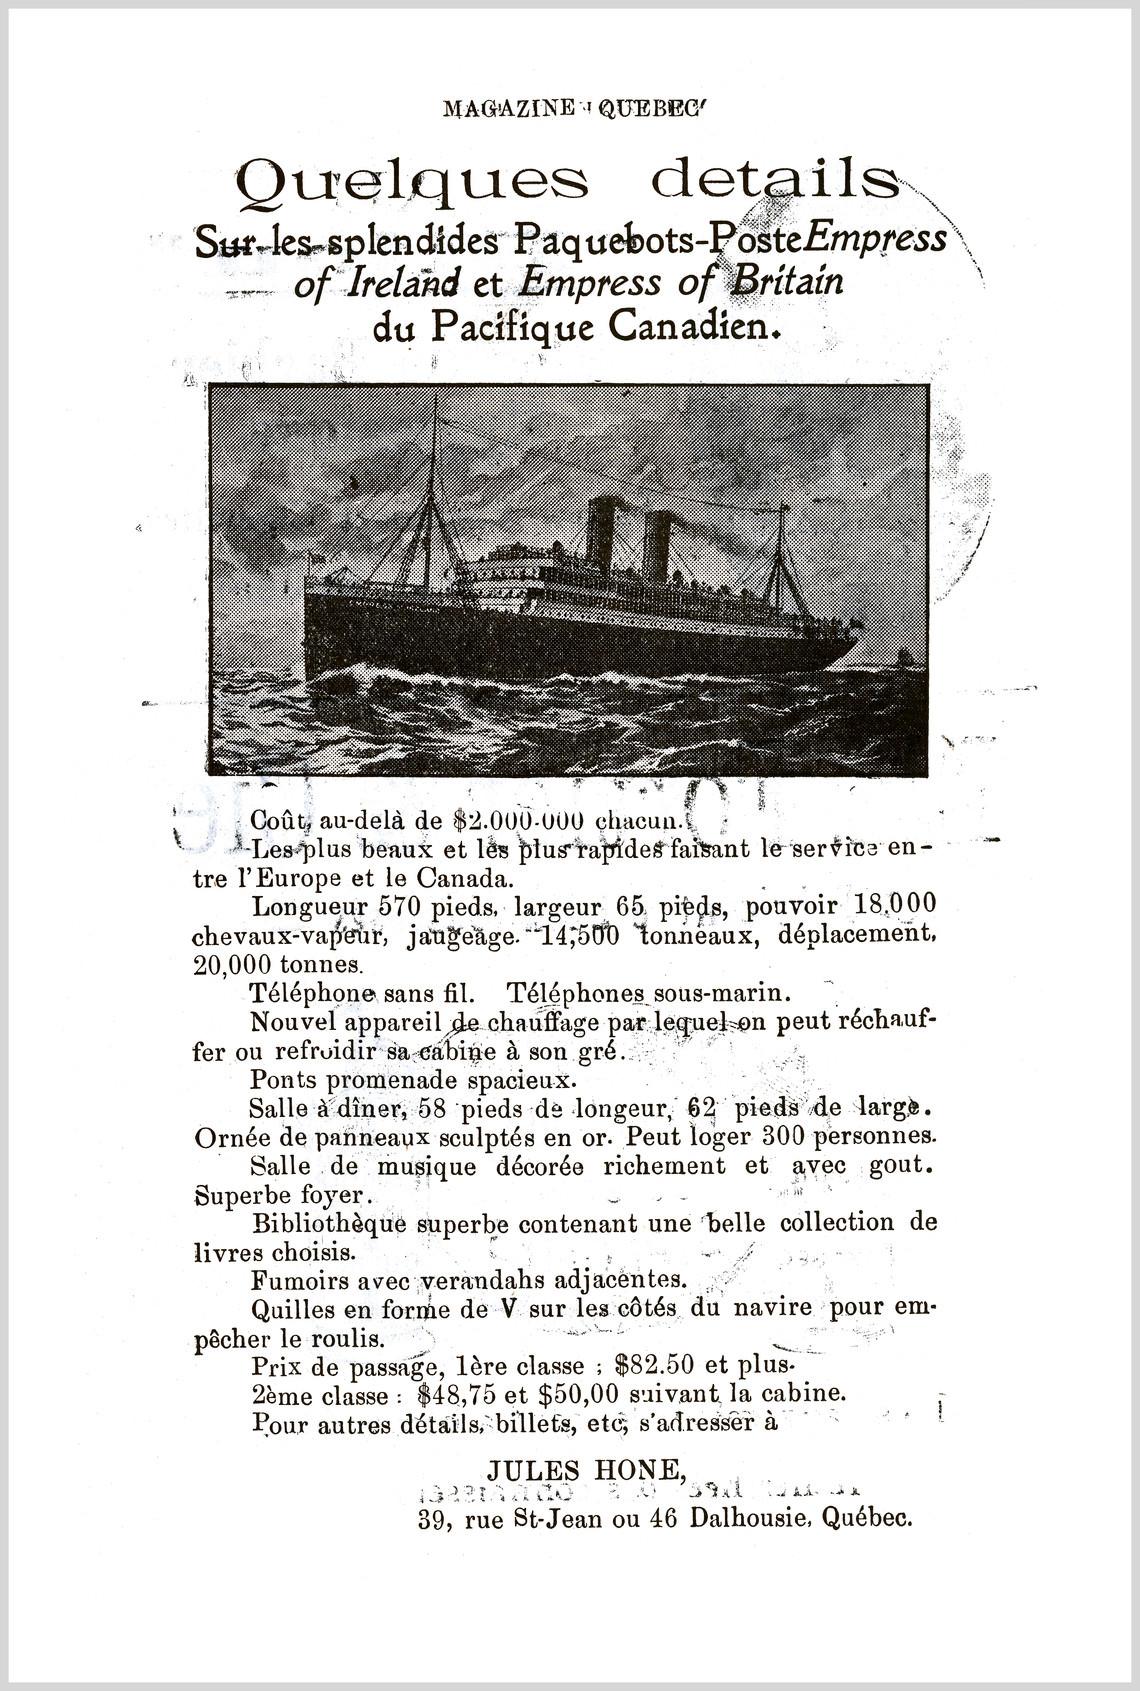 - Publicité No. 3 (Empress of Irland & Empress of Britain)